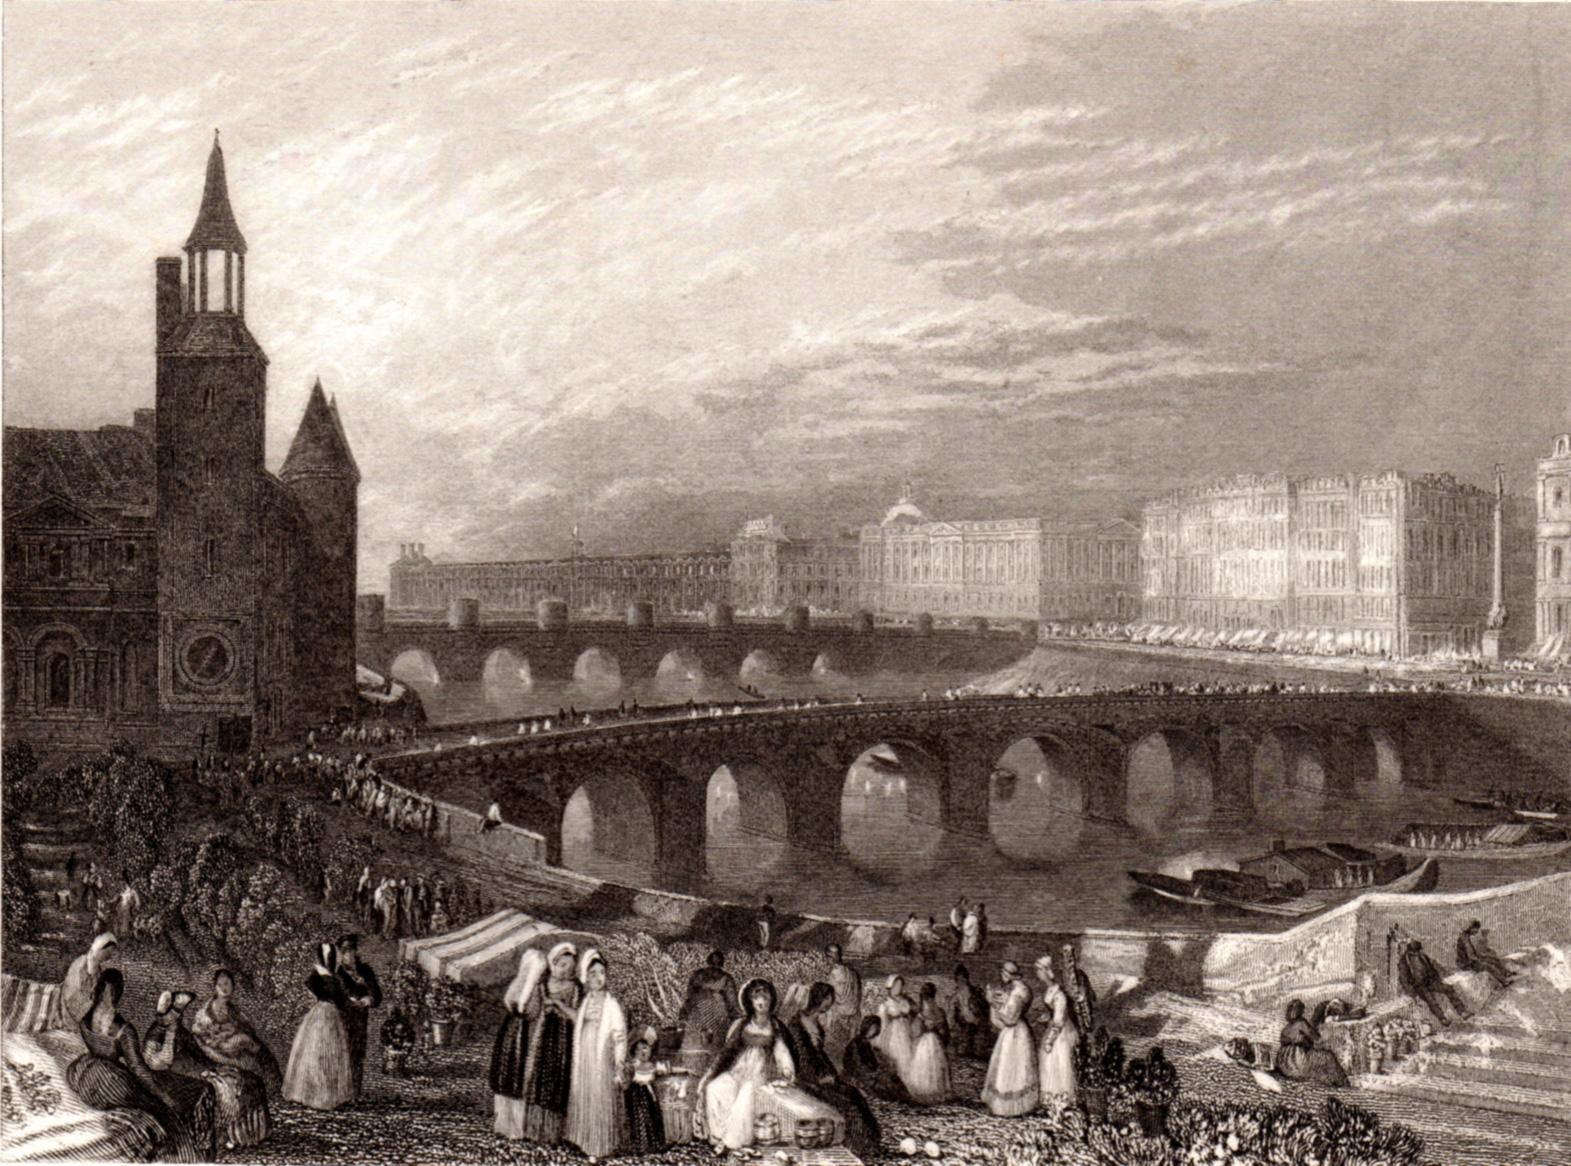 Turner, J.M.W. / Rivers of France